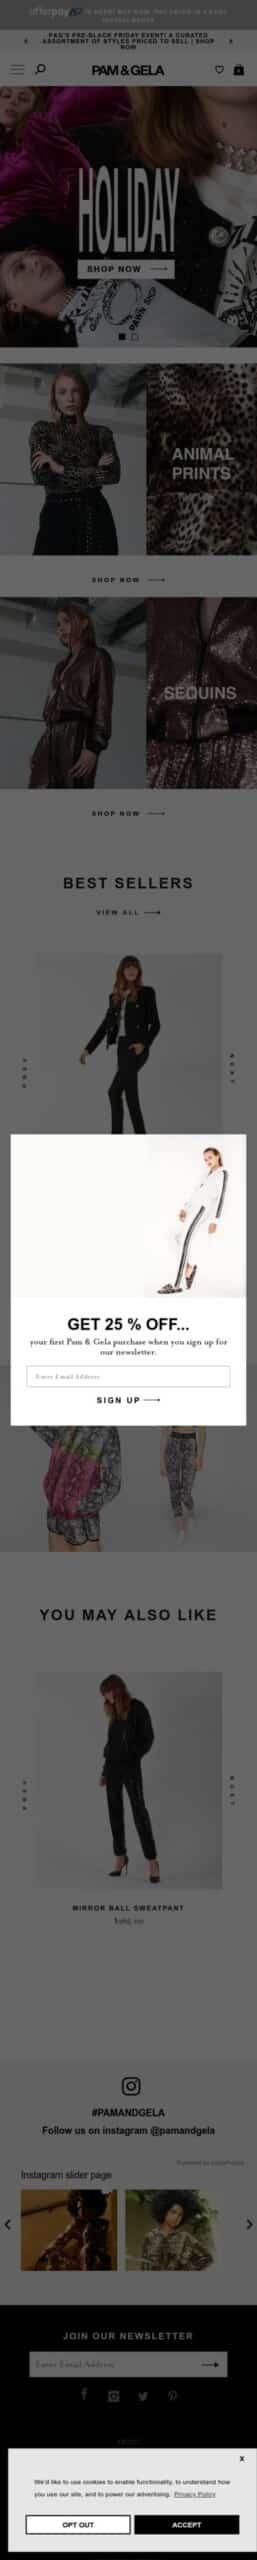 Branded Online- Pam & Gela Coupon